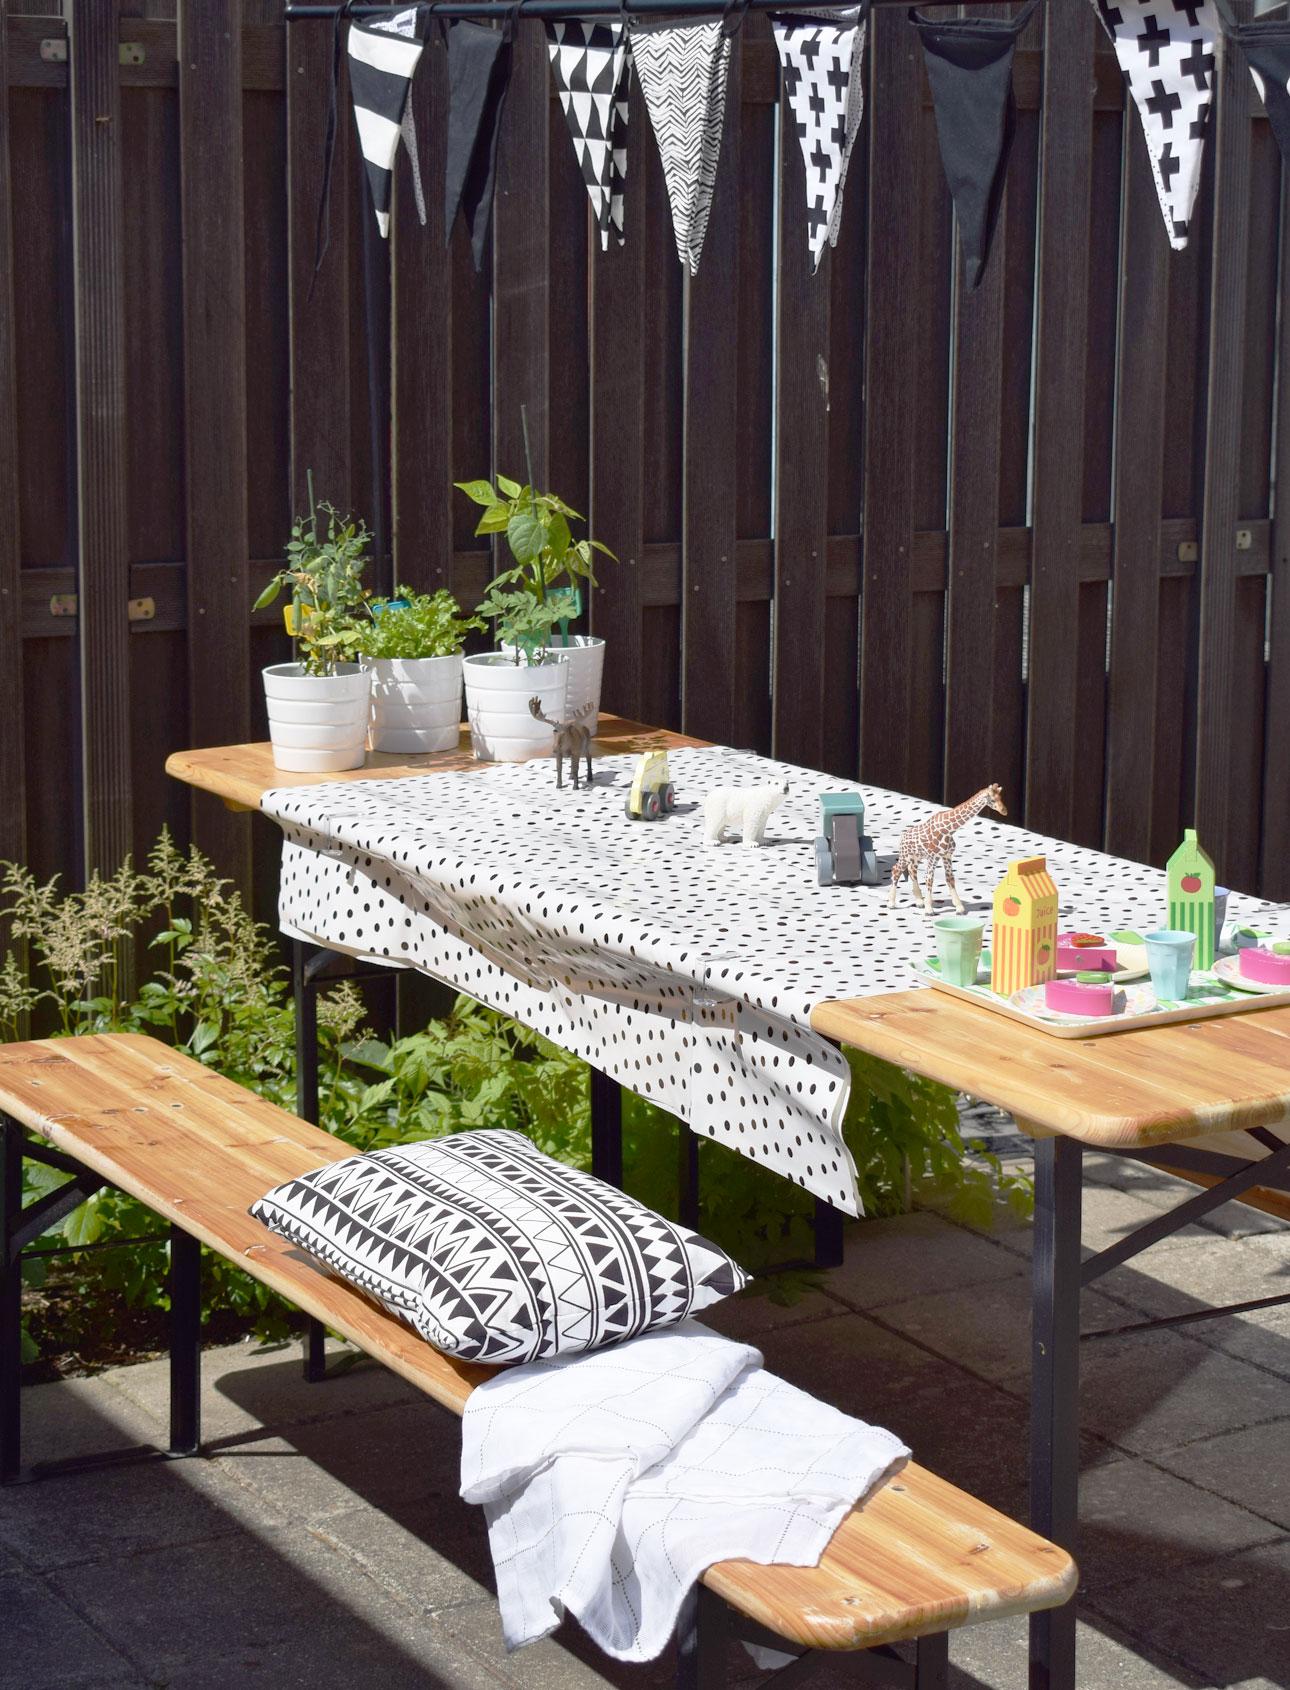 mamalifestyle-tuin-buiten-tafel-speelgoed-slinger